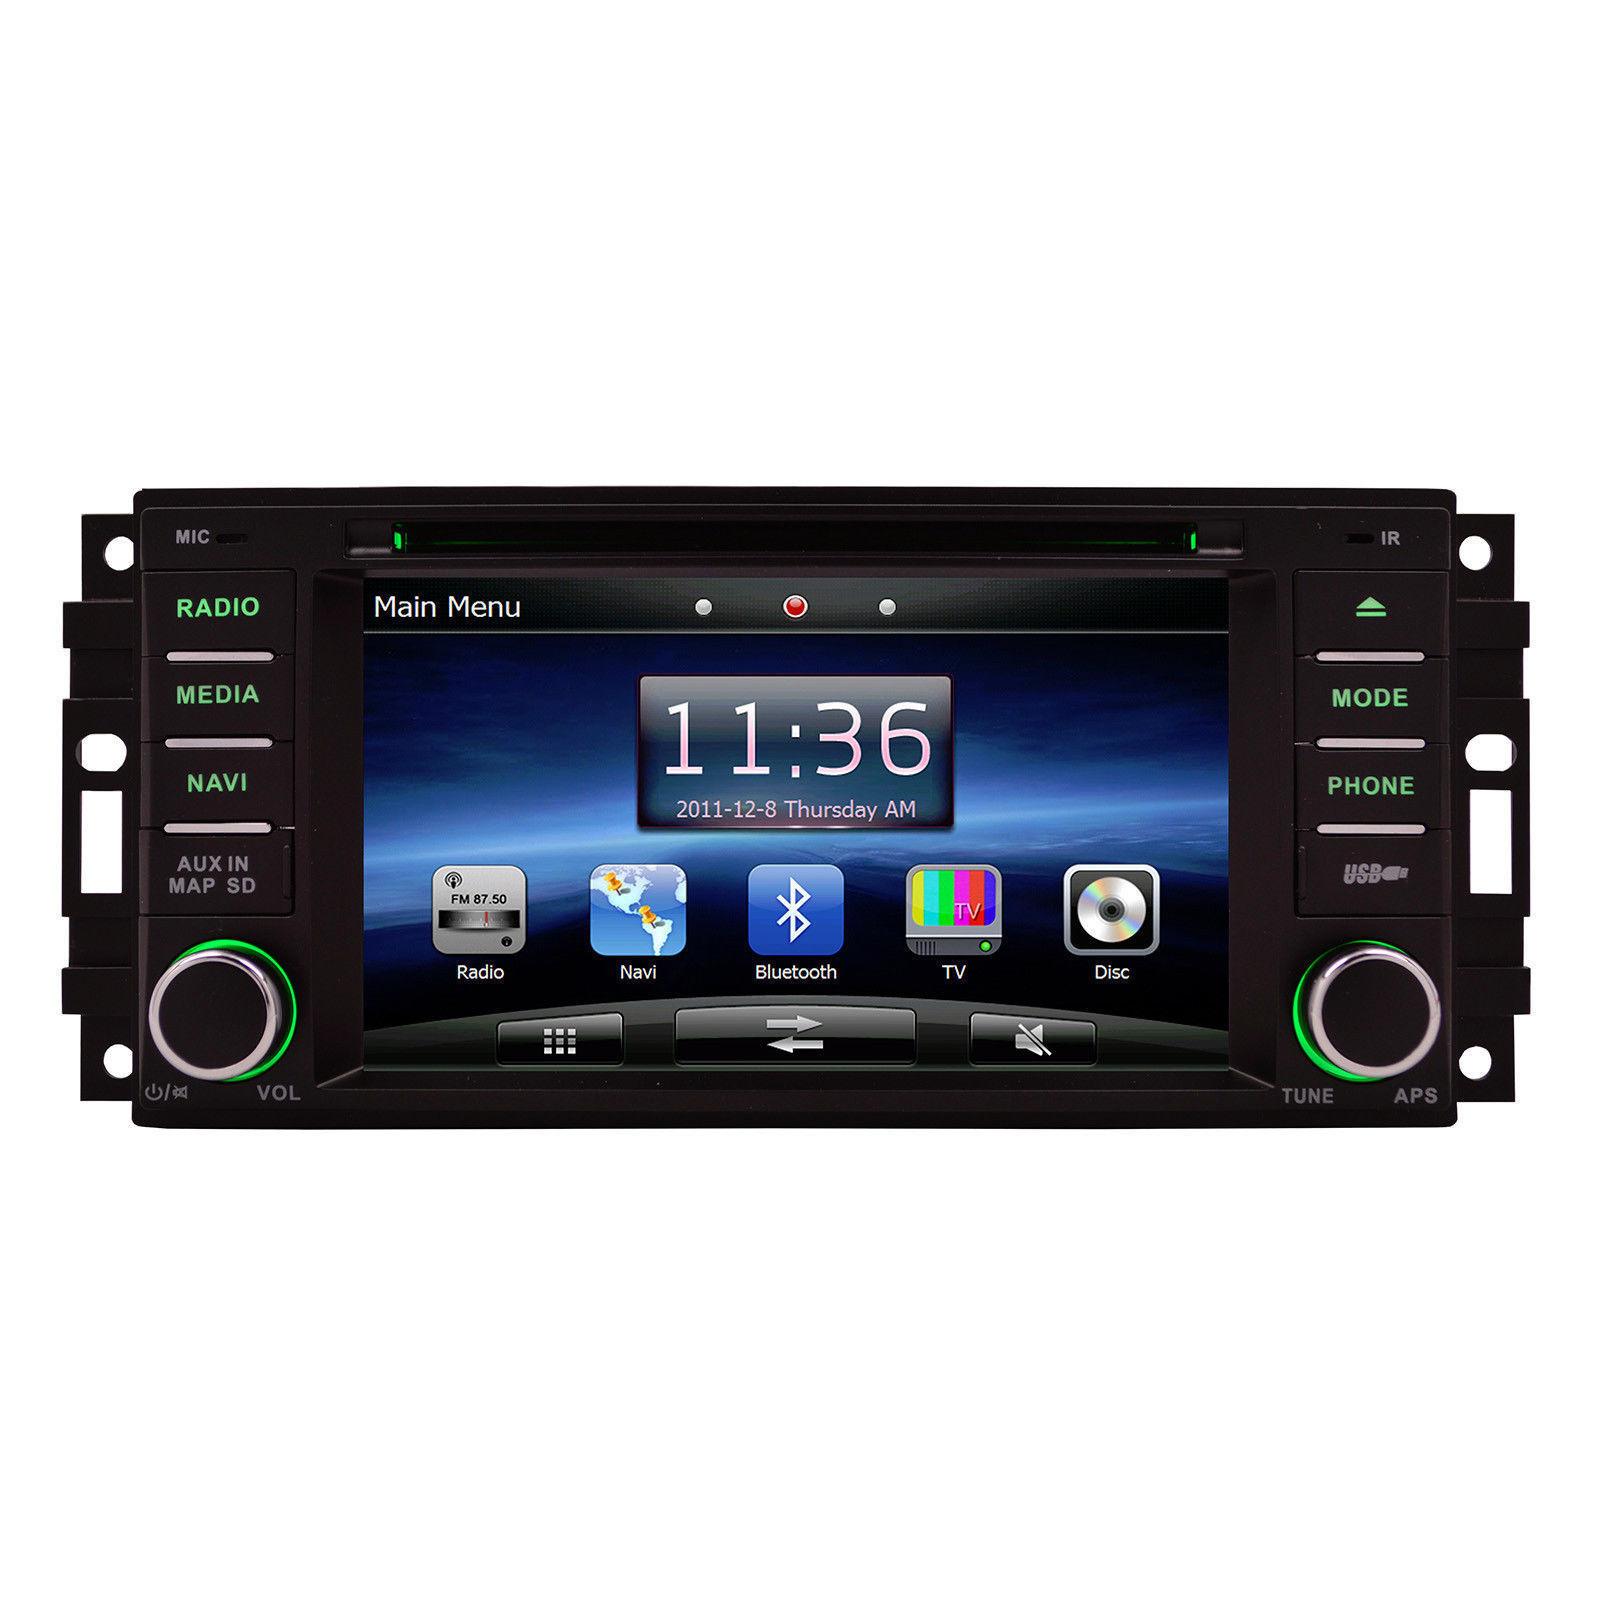 OTTONAVI Chrysler Sebring 2007-2011 K-Series Navigation Radio image 4